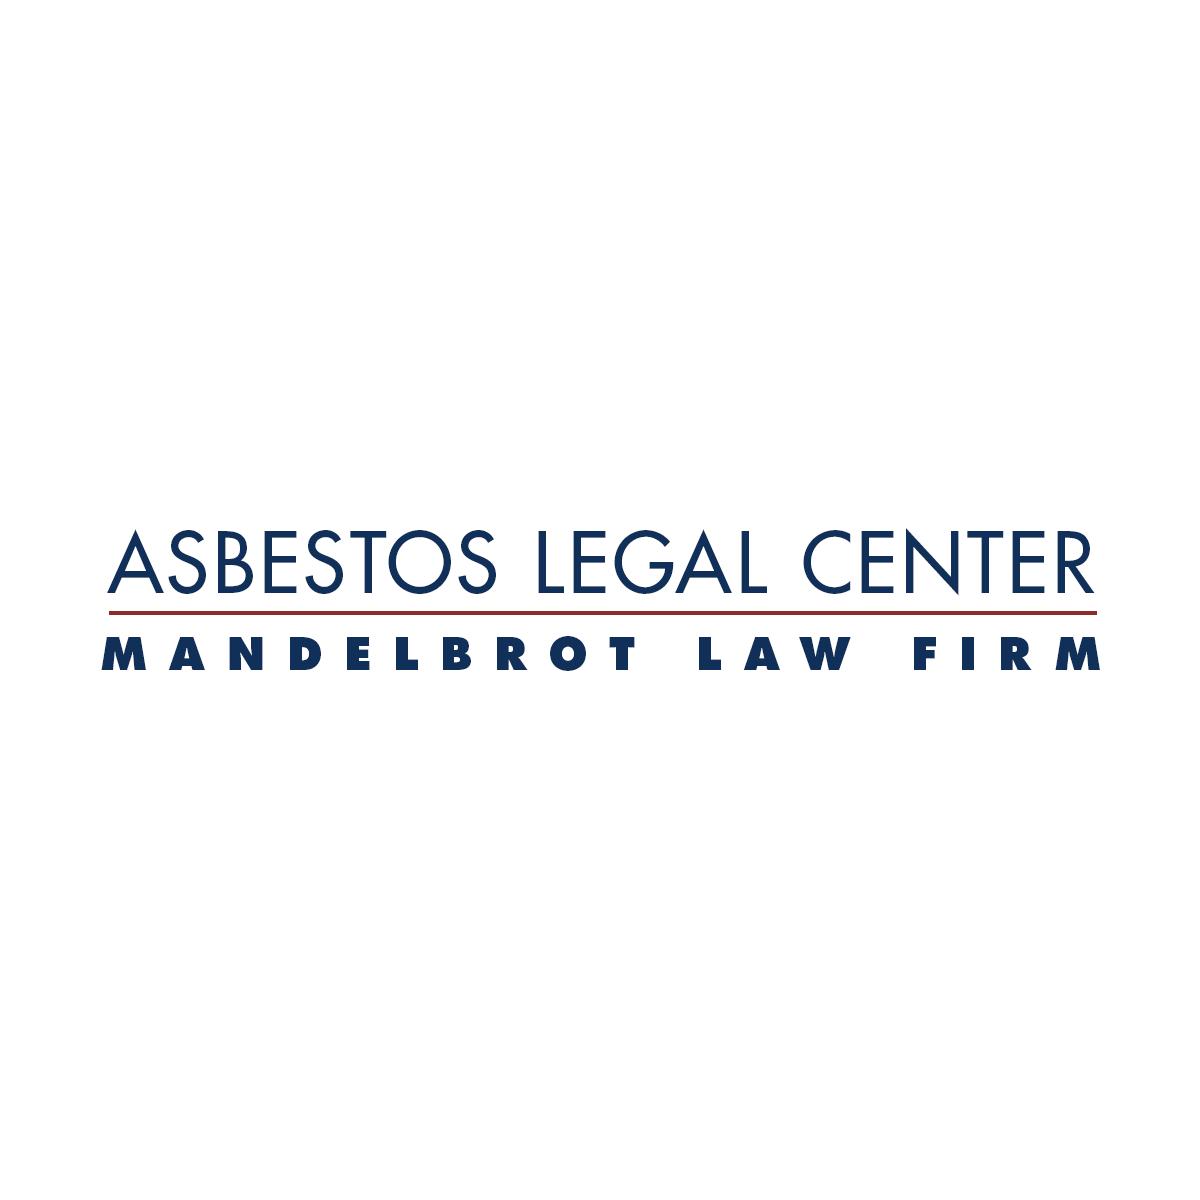 Mesothelioma Lawyer Blog Published By San Francisco California Mesothelioma Attorneys Asbestos Legal Center